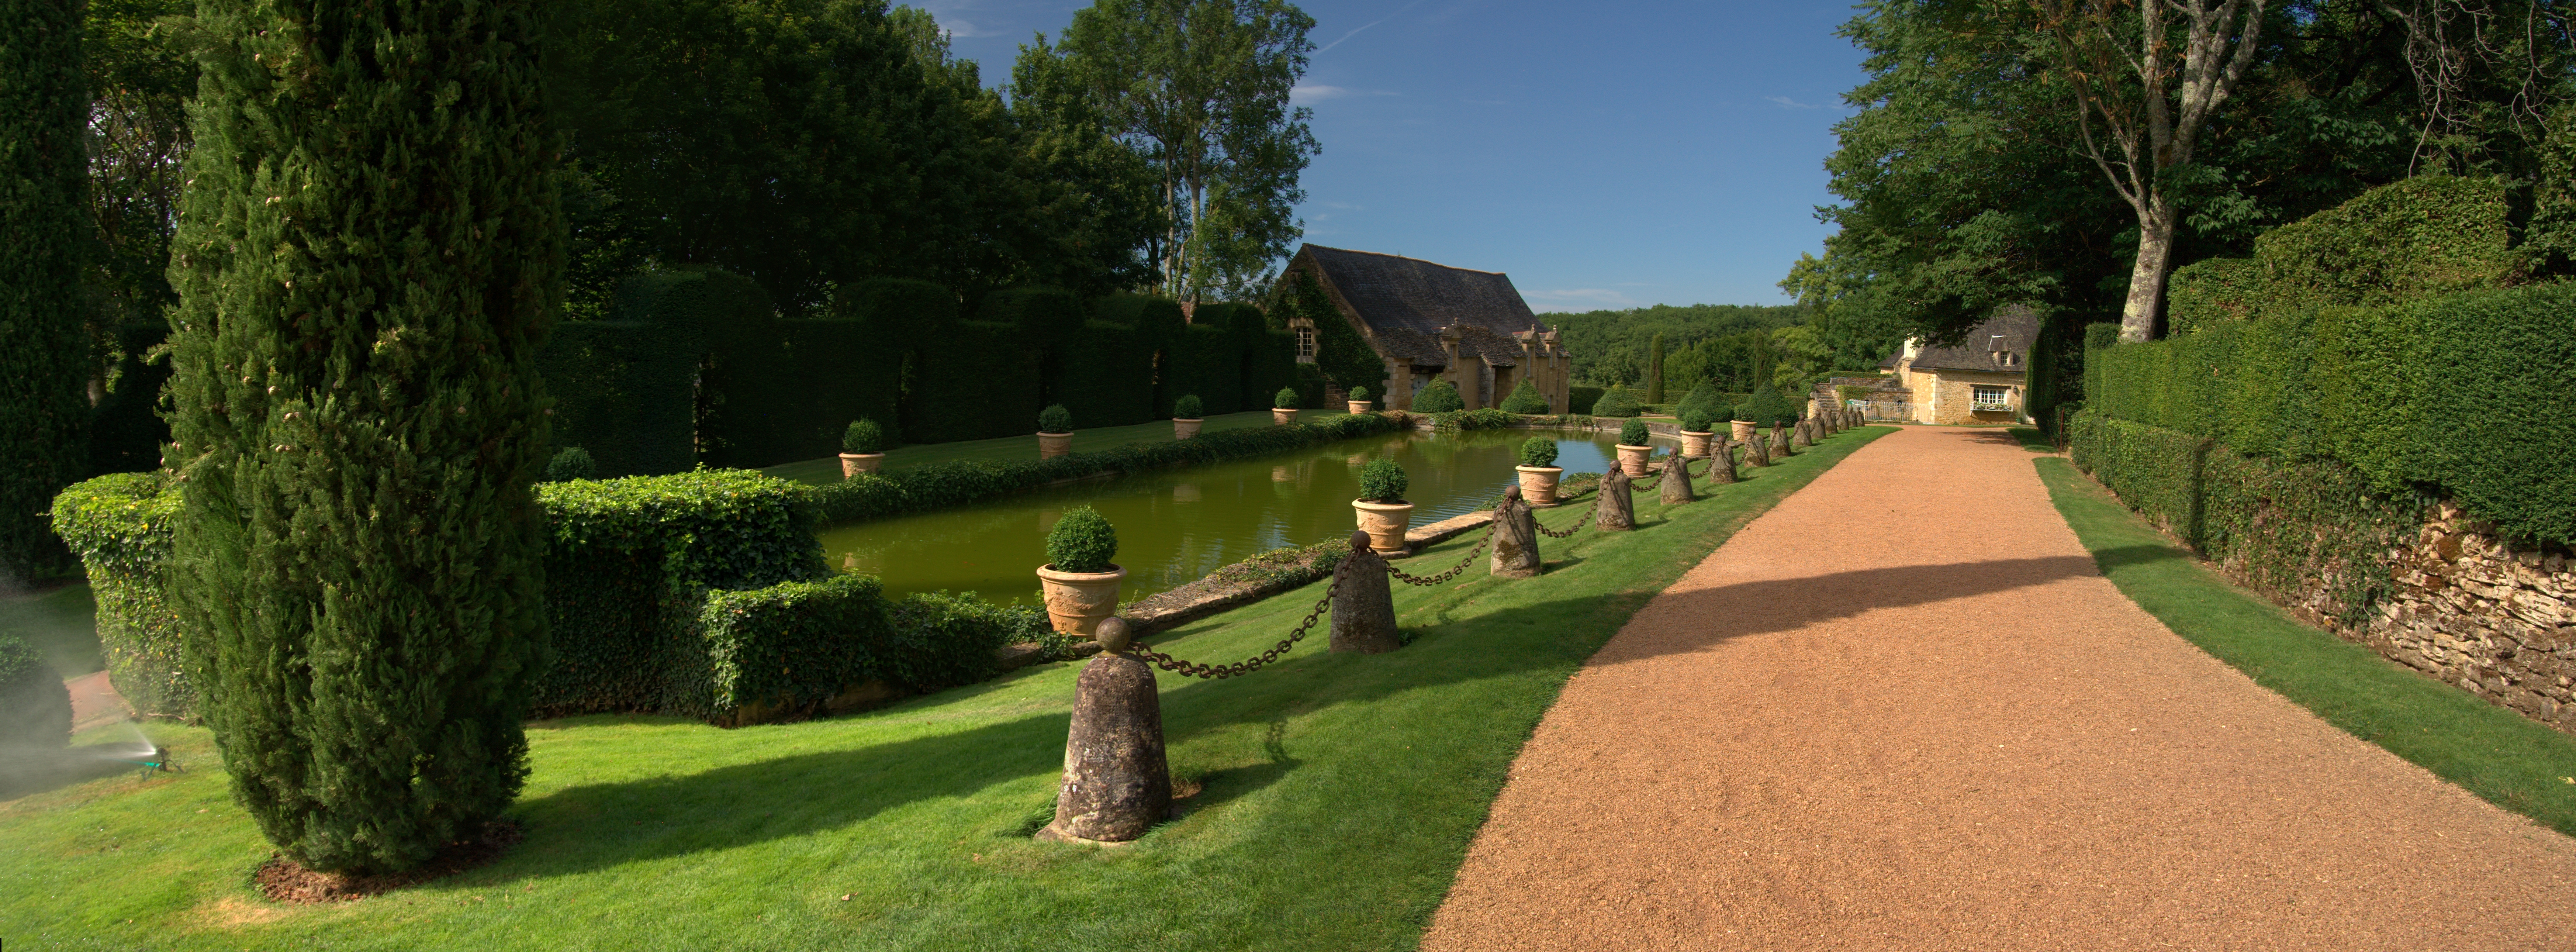 fileles jardins deyrignac 35 stitchjpg - Jardin D Eyrignac